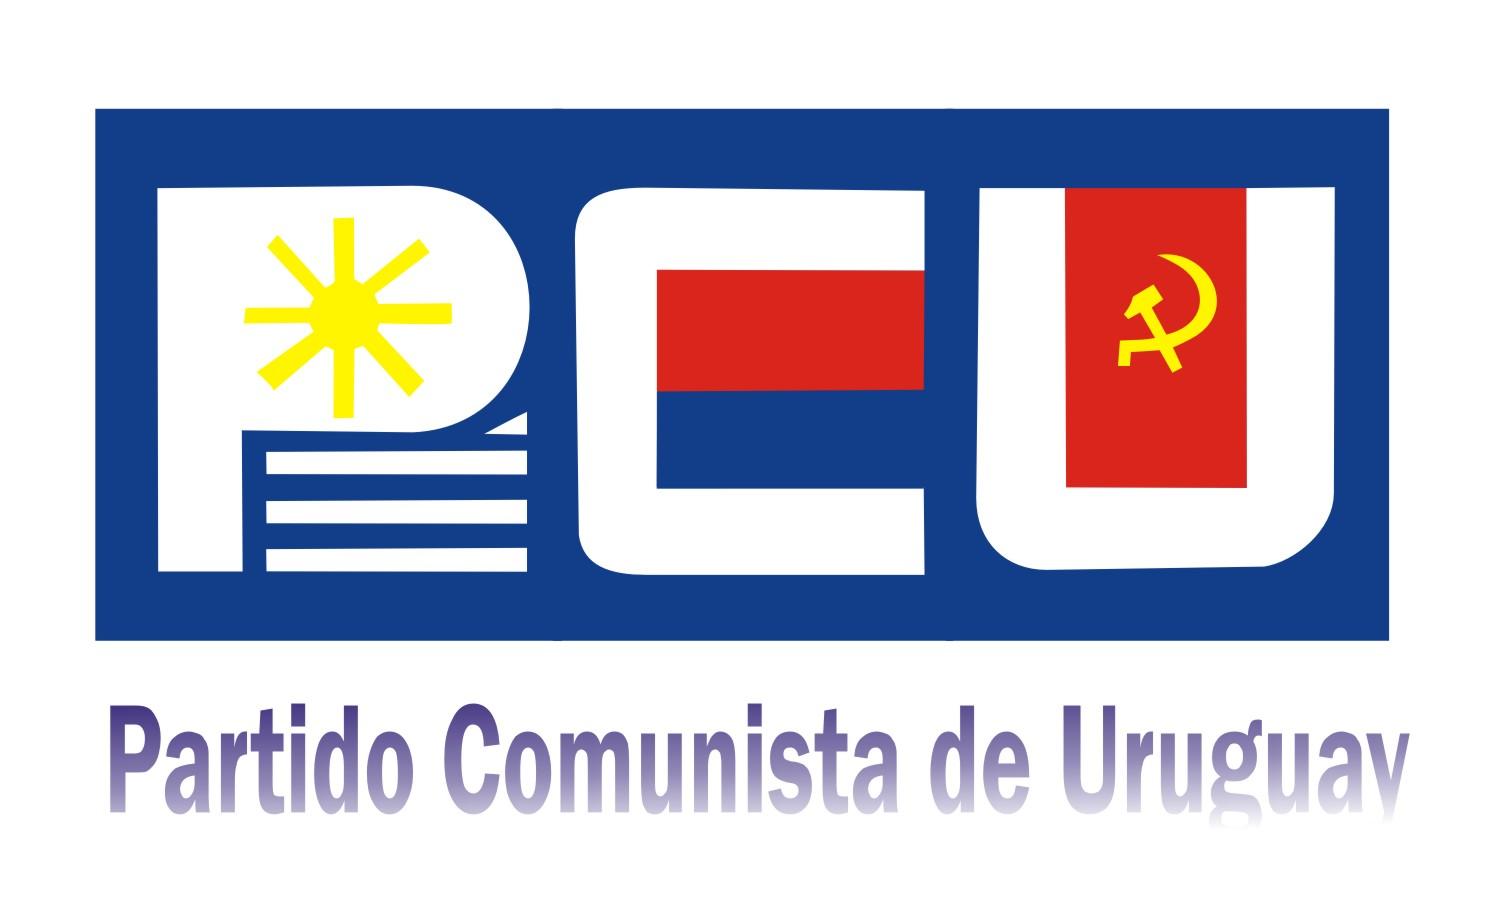 Comunicado del Partido Comunista de Uruguay Logo+pcu